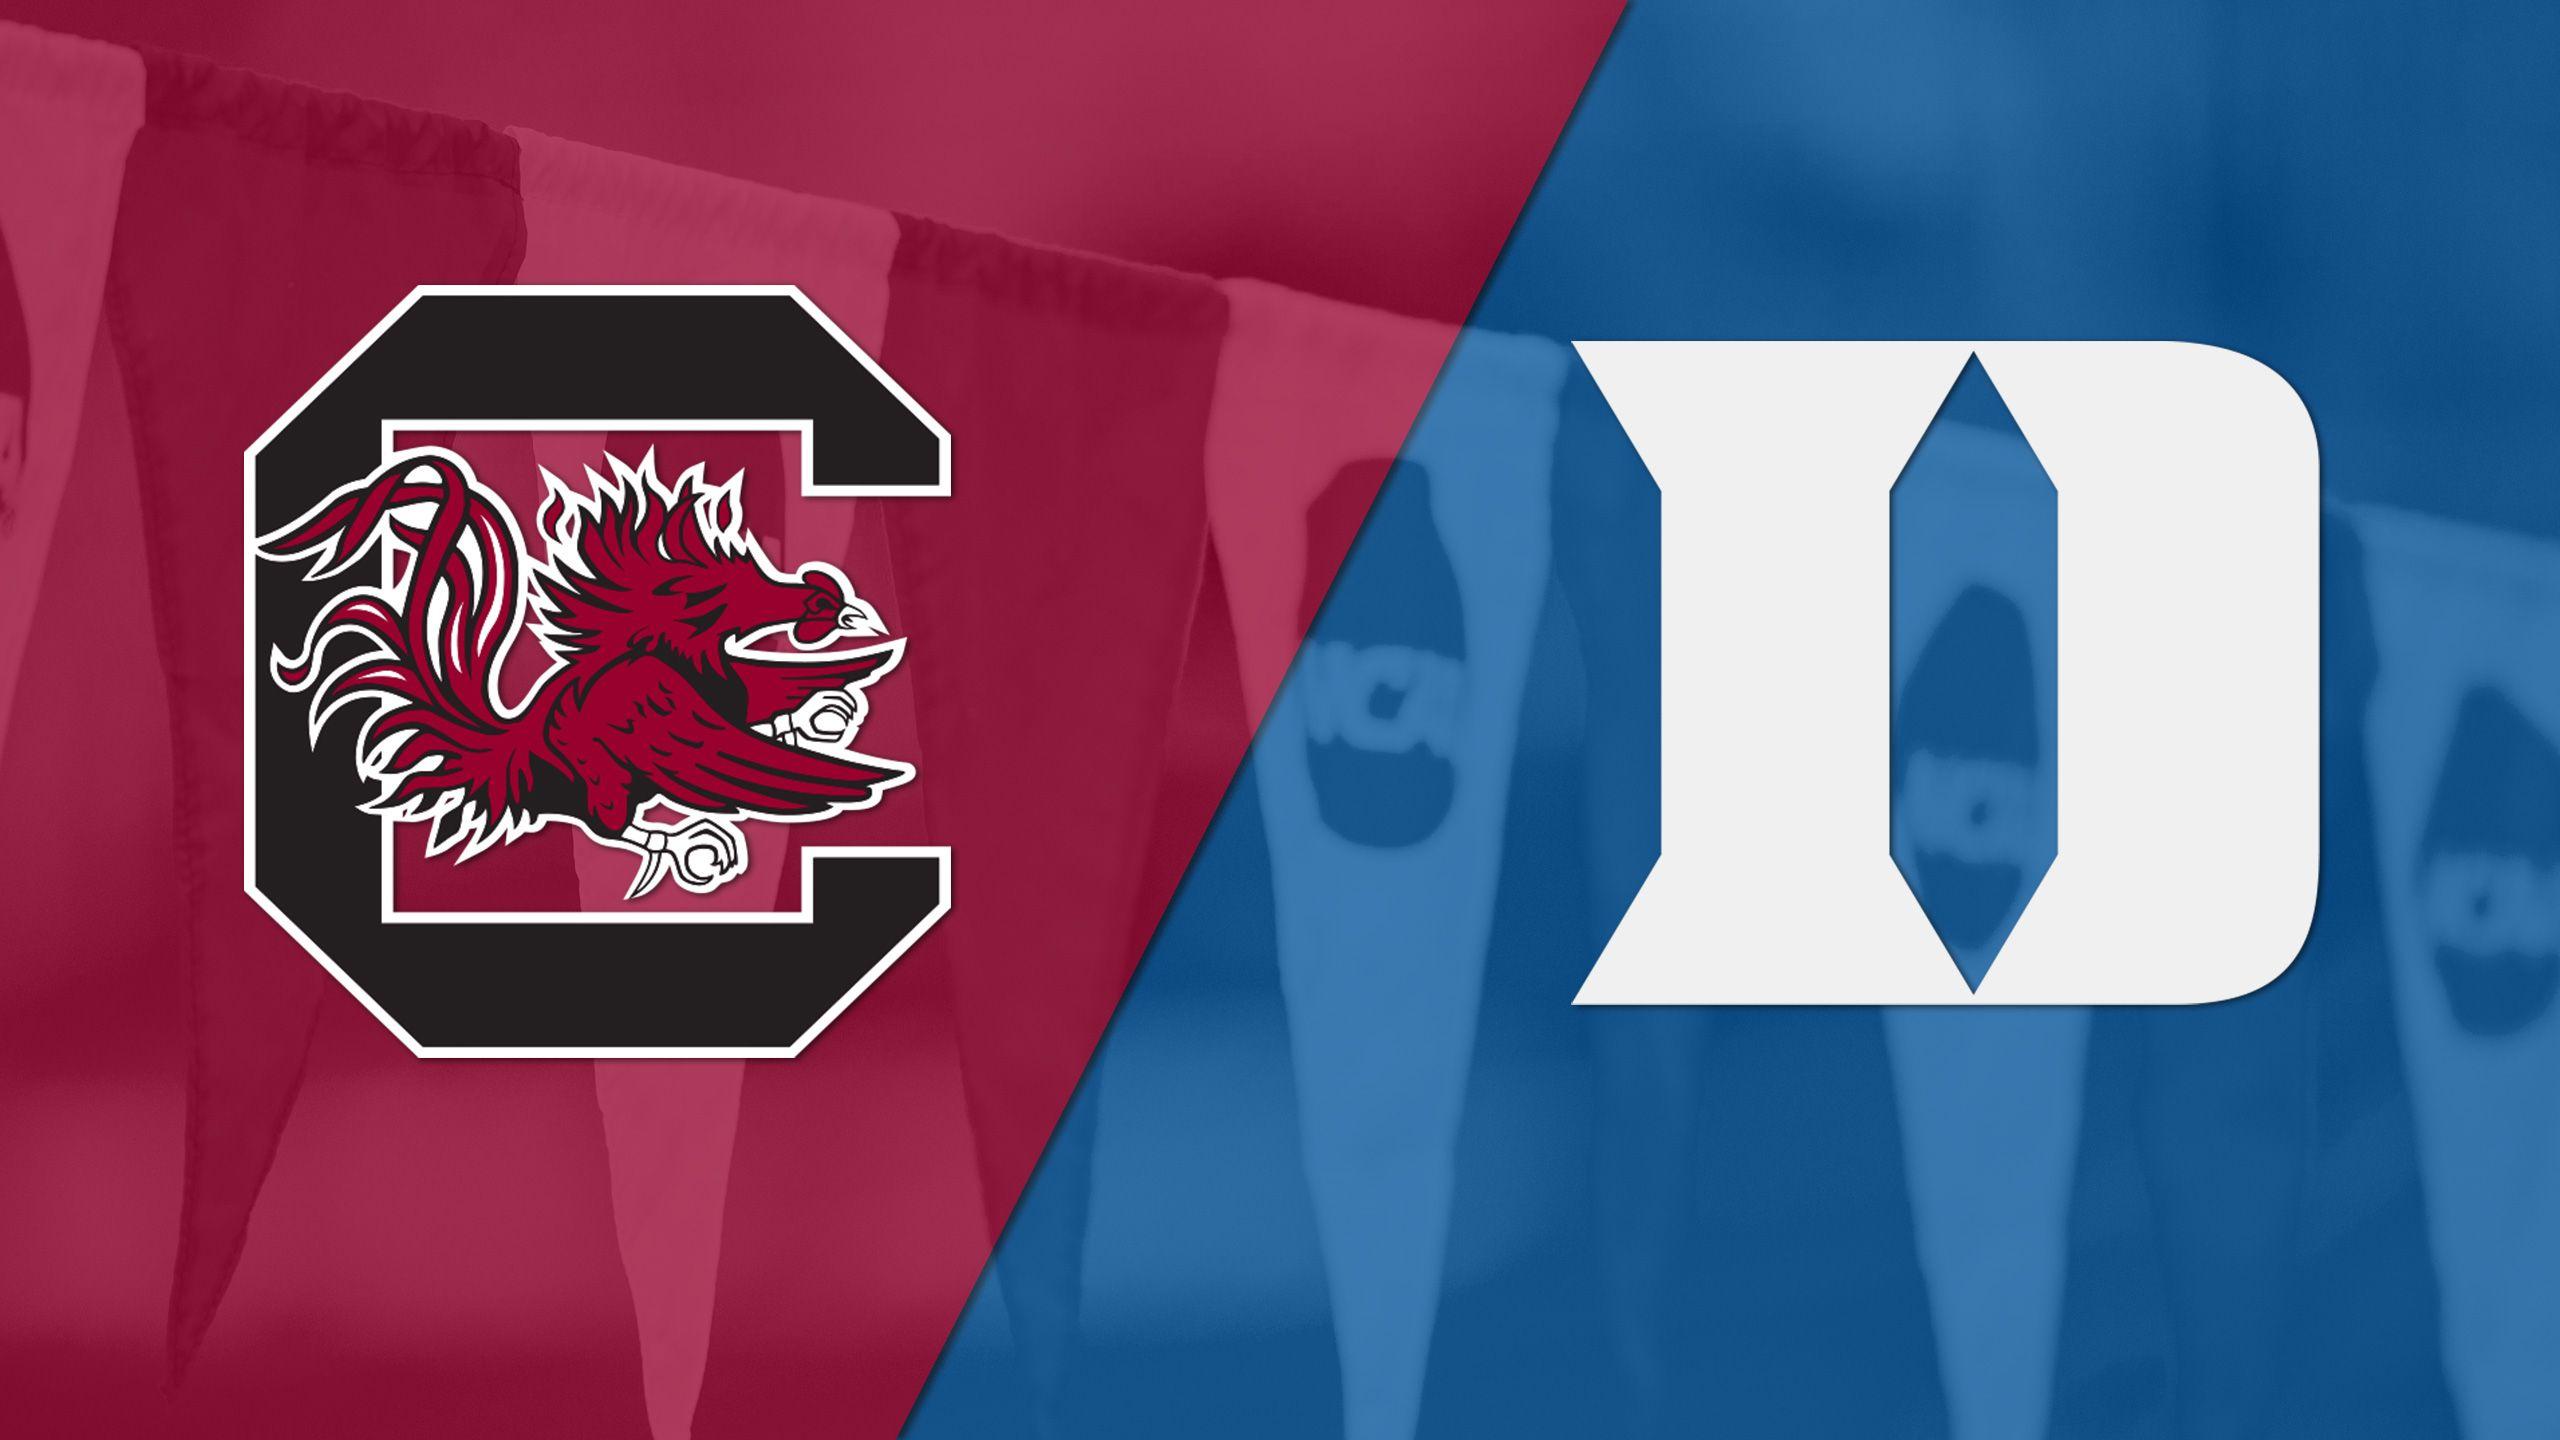 South Carolina vs. Duke (Swimming)